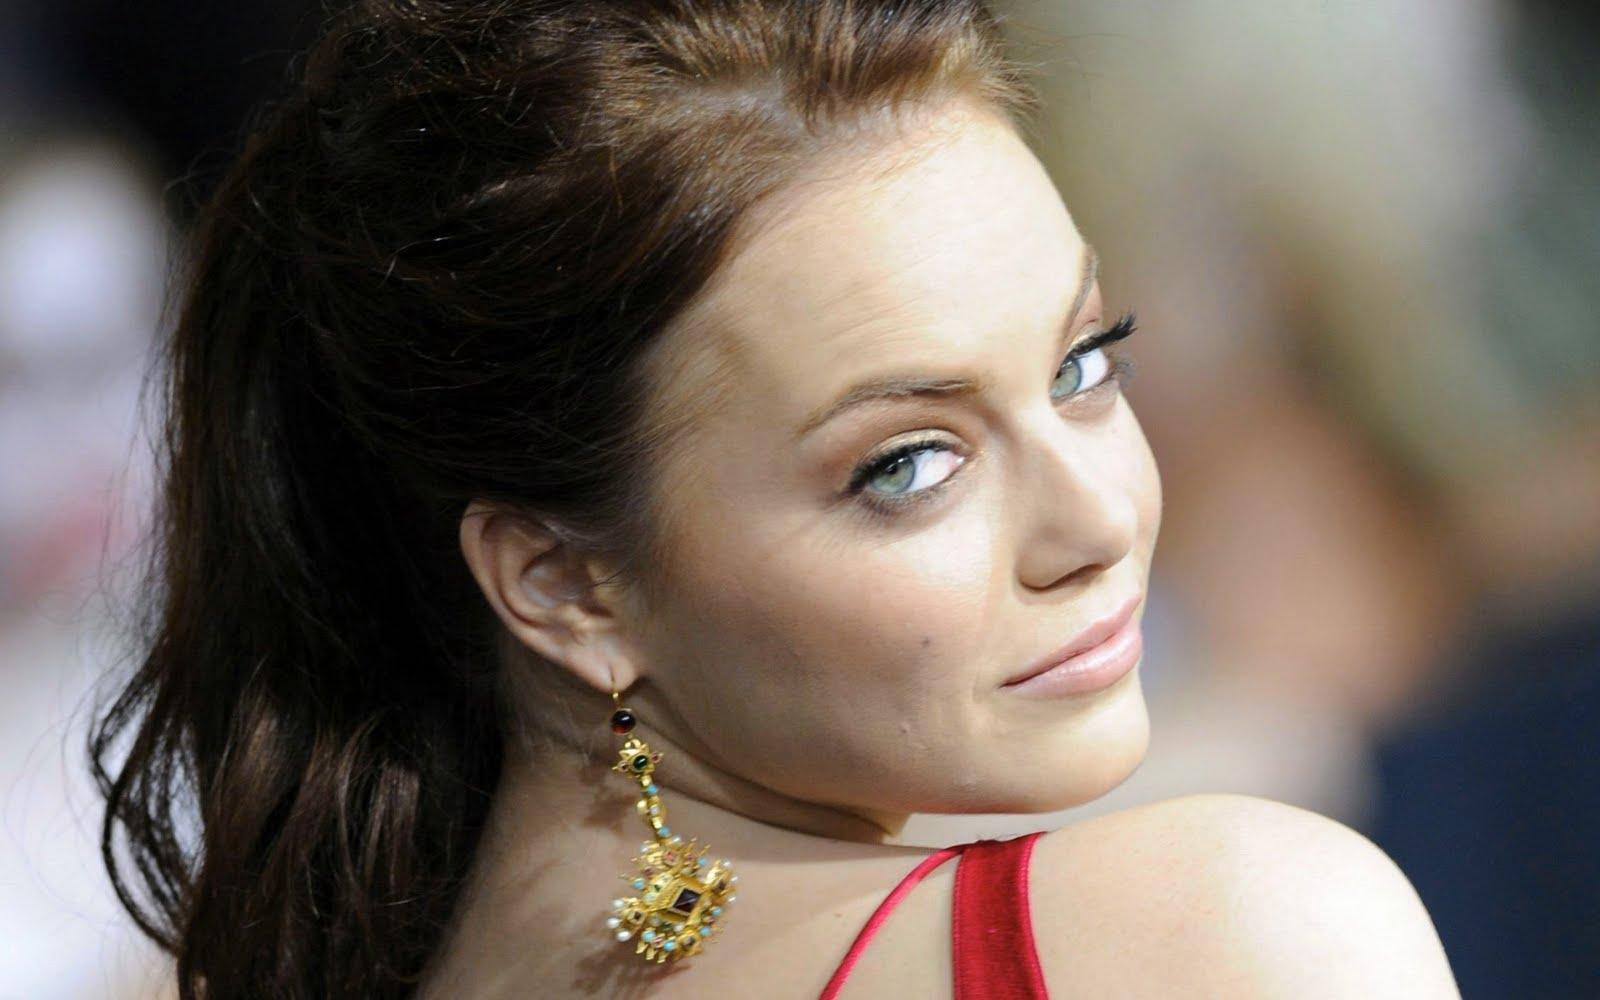 http://1.bp.blogspot.com/-9oehcQFN3w0/Tlb_4xF6XKI/AAAAAAAABUg/Zb0mDrgRjVE/s1600/Emma+Stone+Pictures+5.jpg